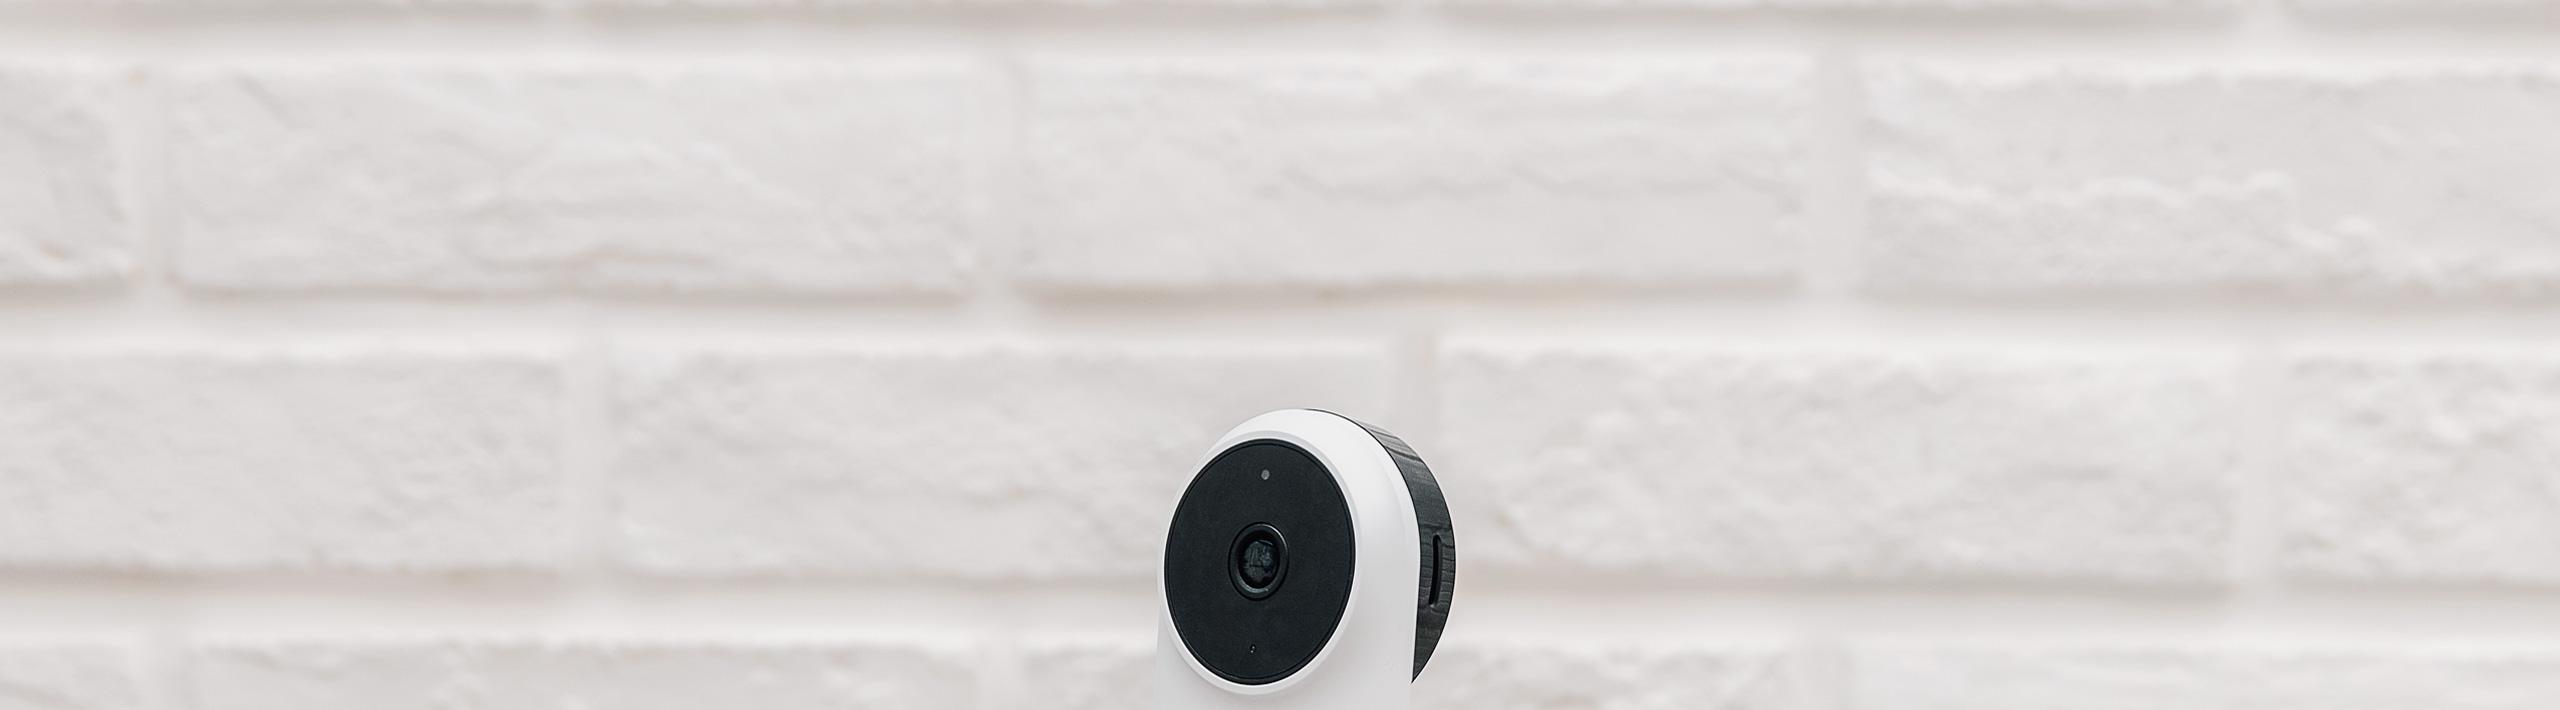 Mi Home Security Camera Wireless IP Surveillance System